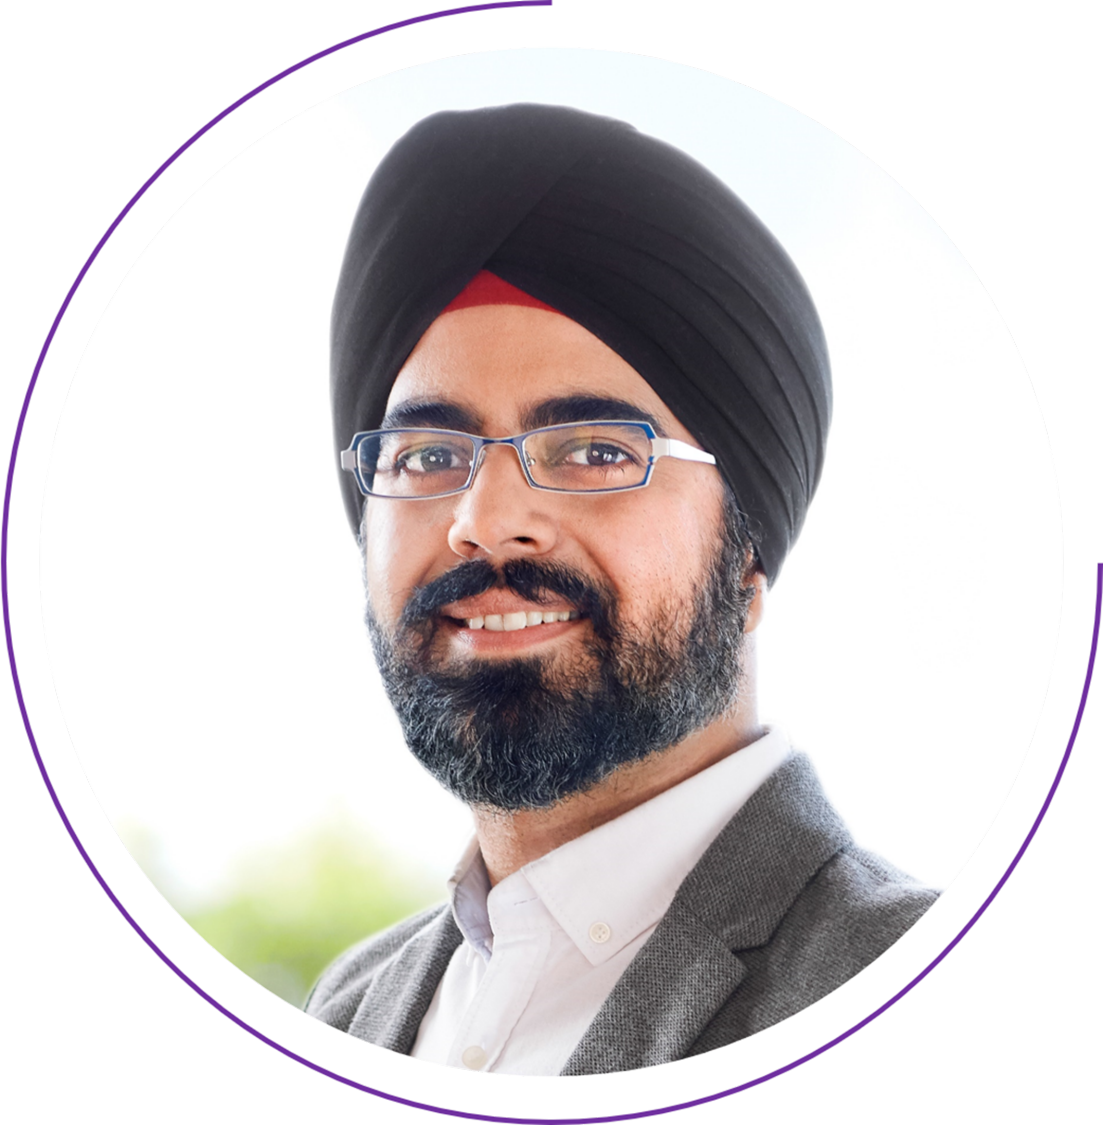 Portrait of Puneet Singh from Siemens Energy